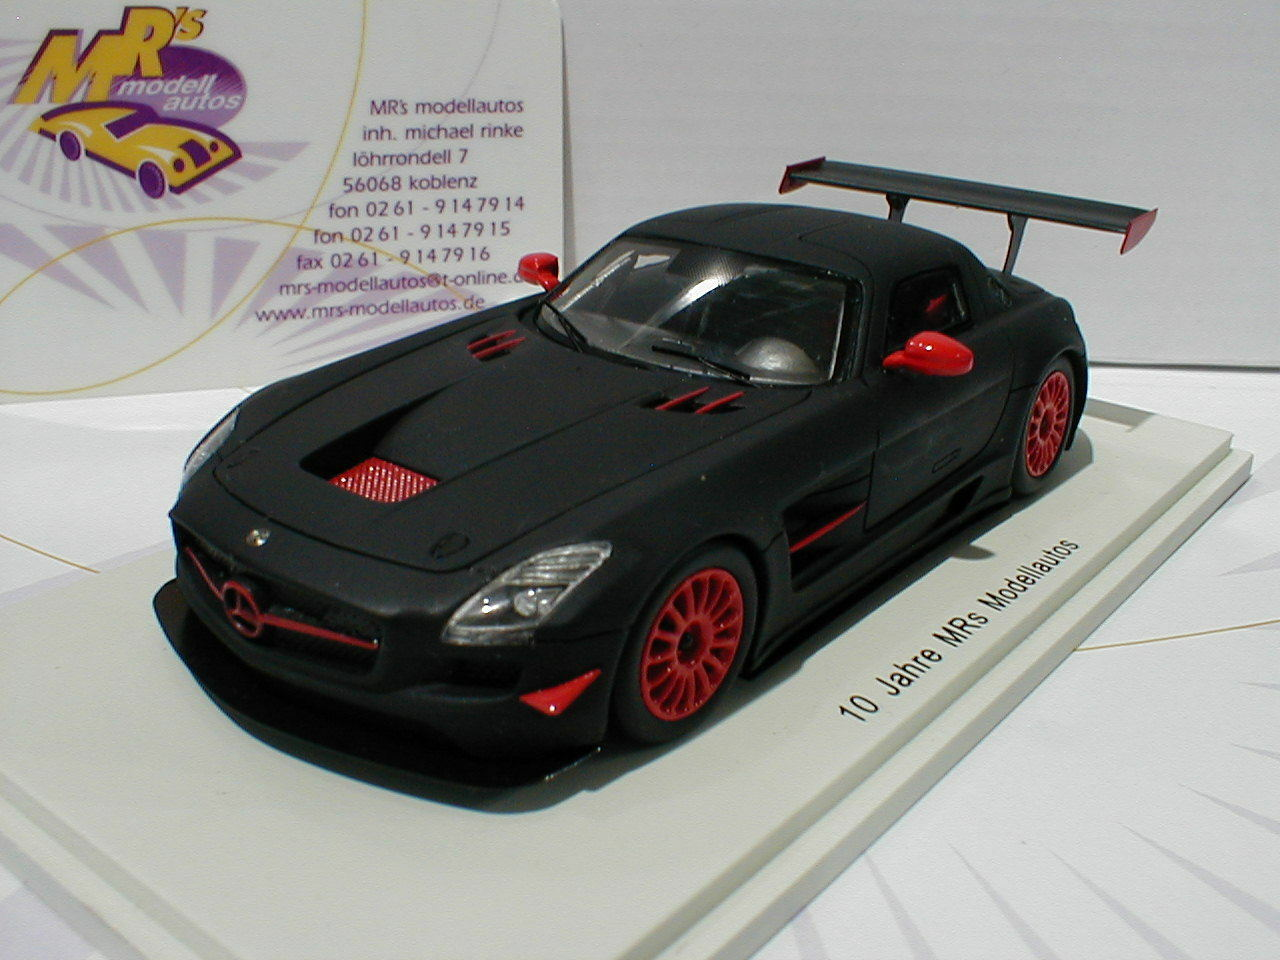 Spark mrs001   Mercedes Benz SLS gt3 AMG  10 años Sr 's modelo coches  1 43 nuevo